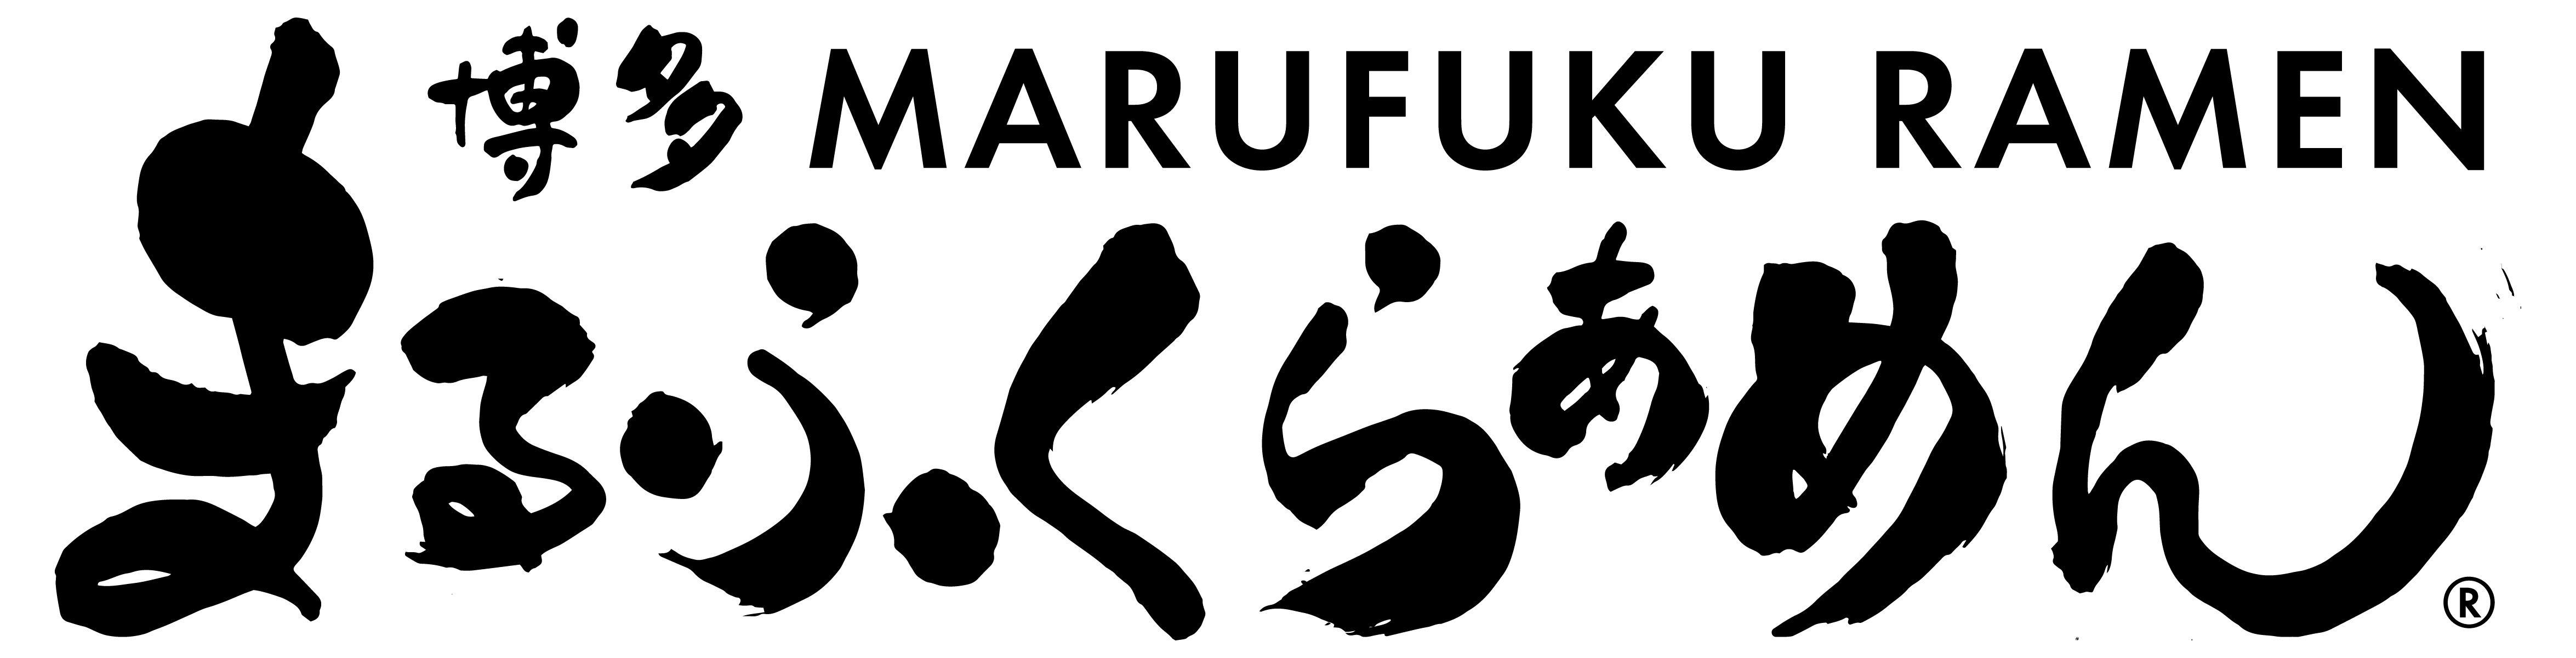 Marufuku Franchising